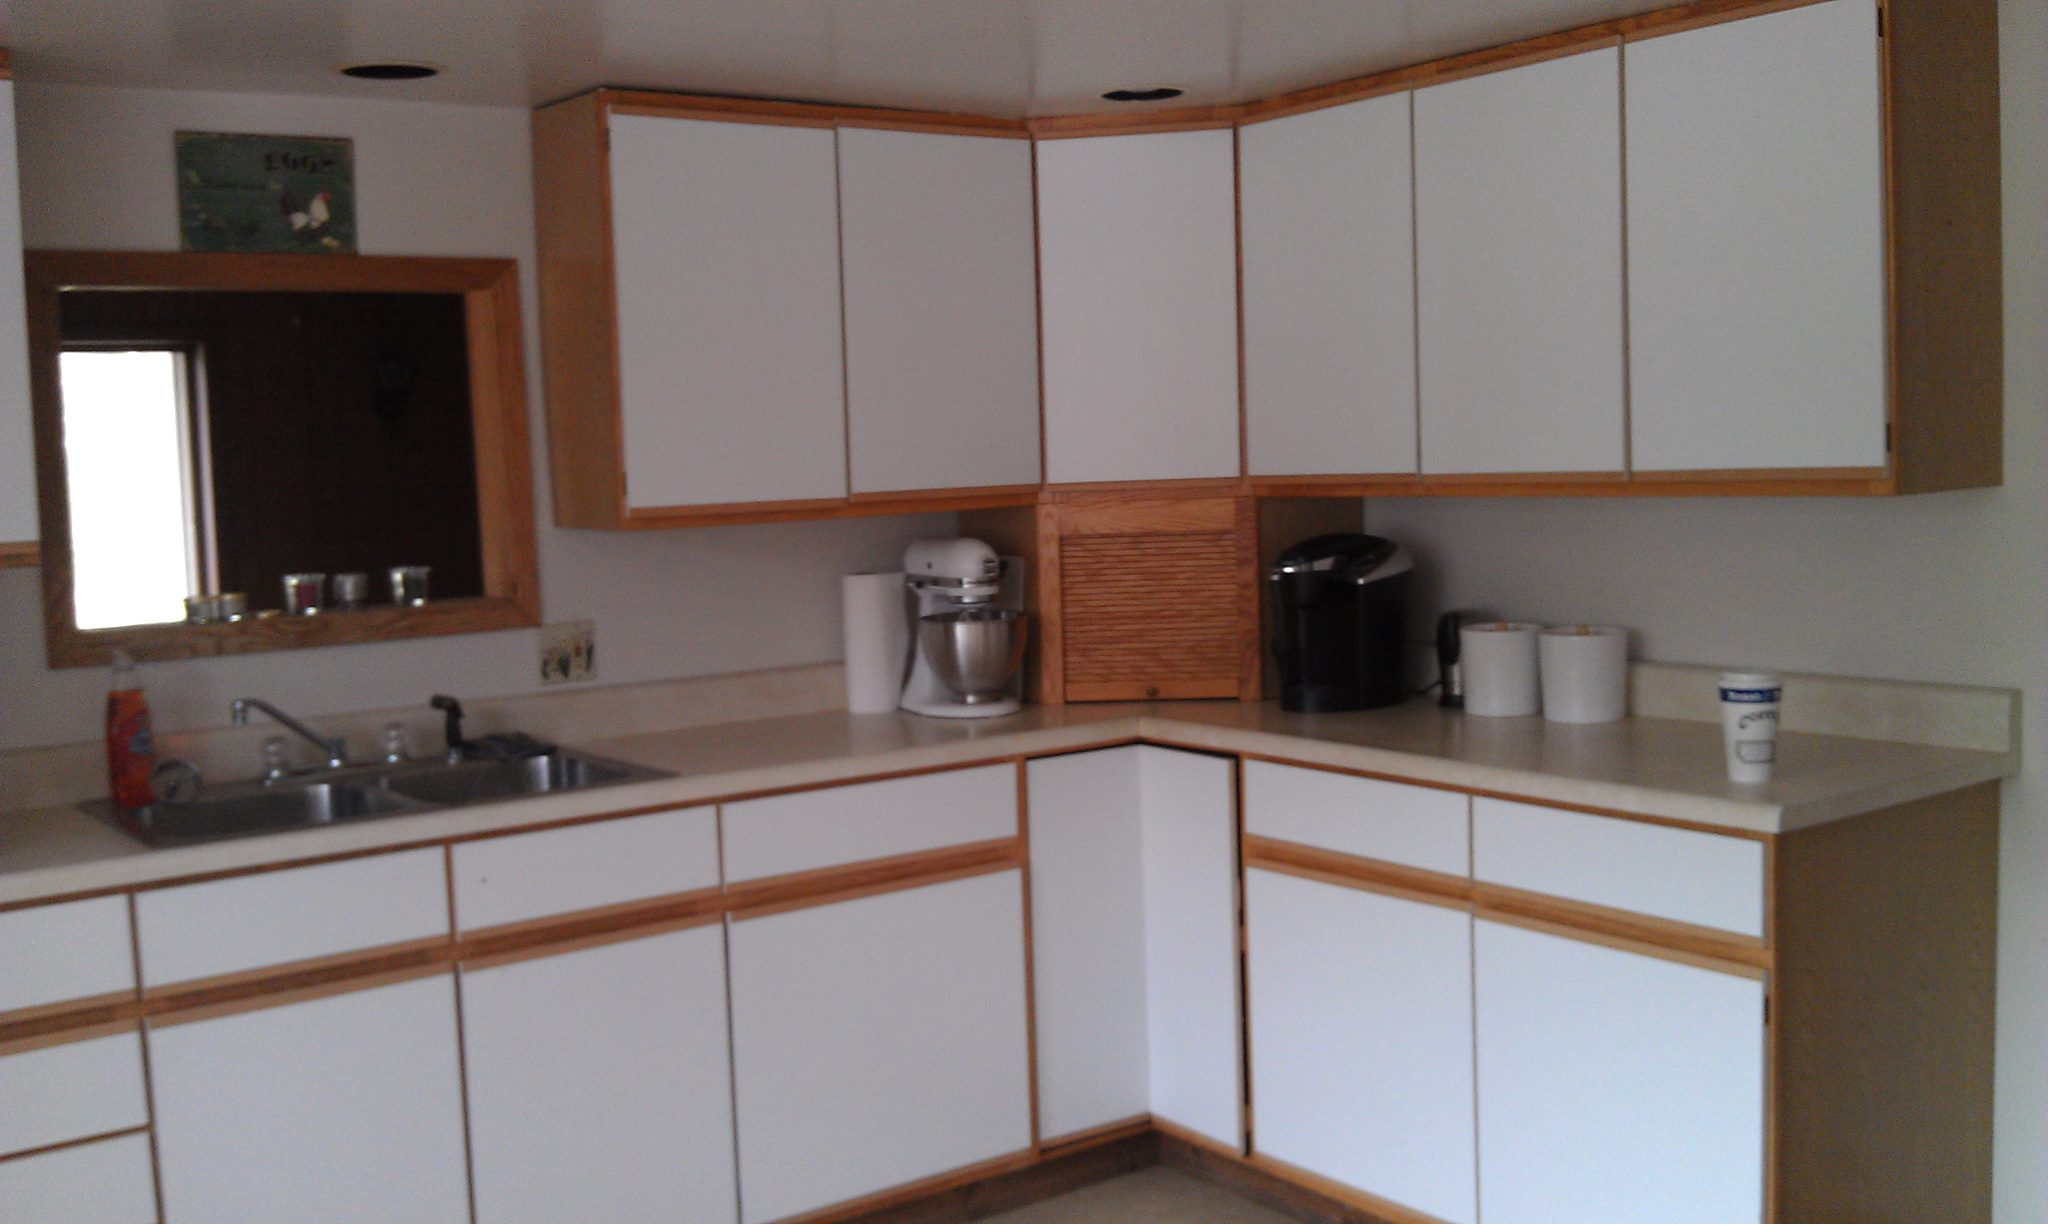 Blank Kitchen Wall Kitchen Sink Facing A Blank Wall Drives Me Insane Mirror Floor